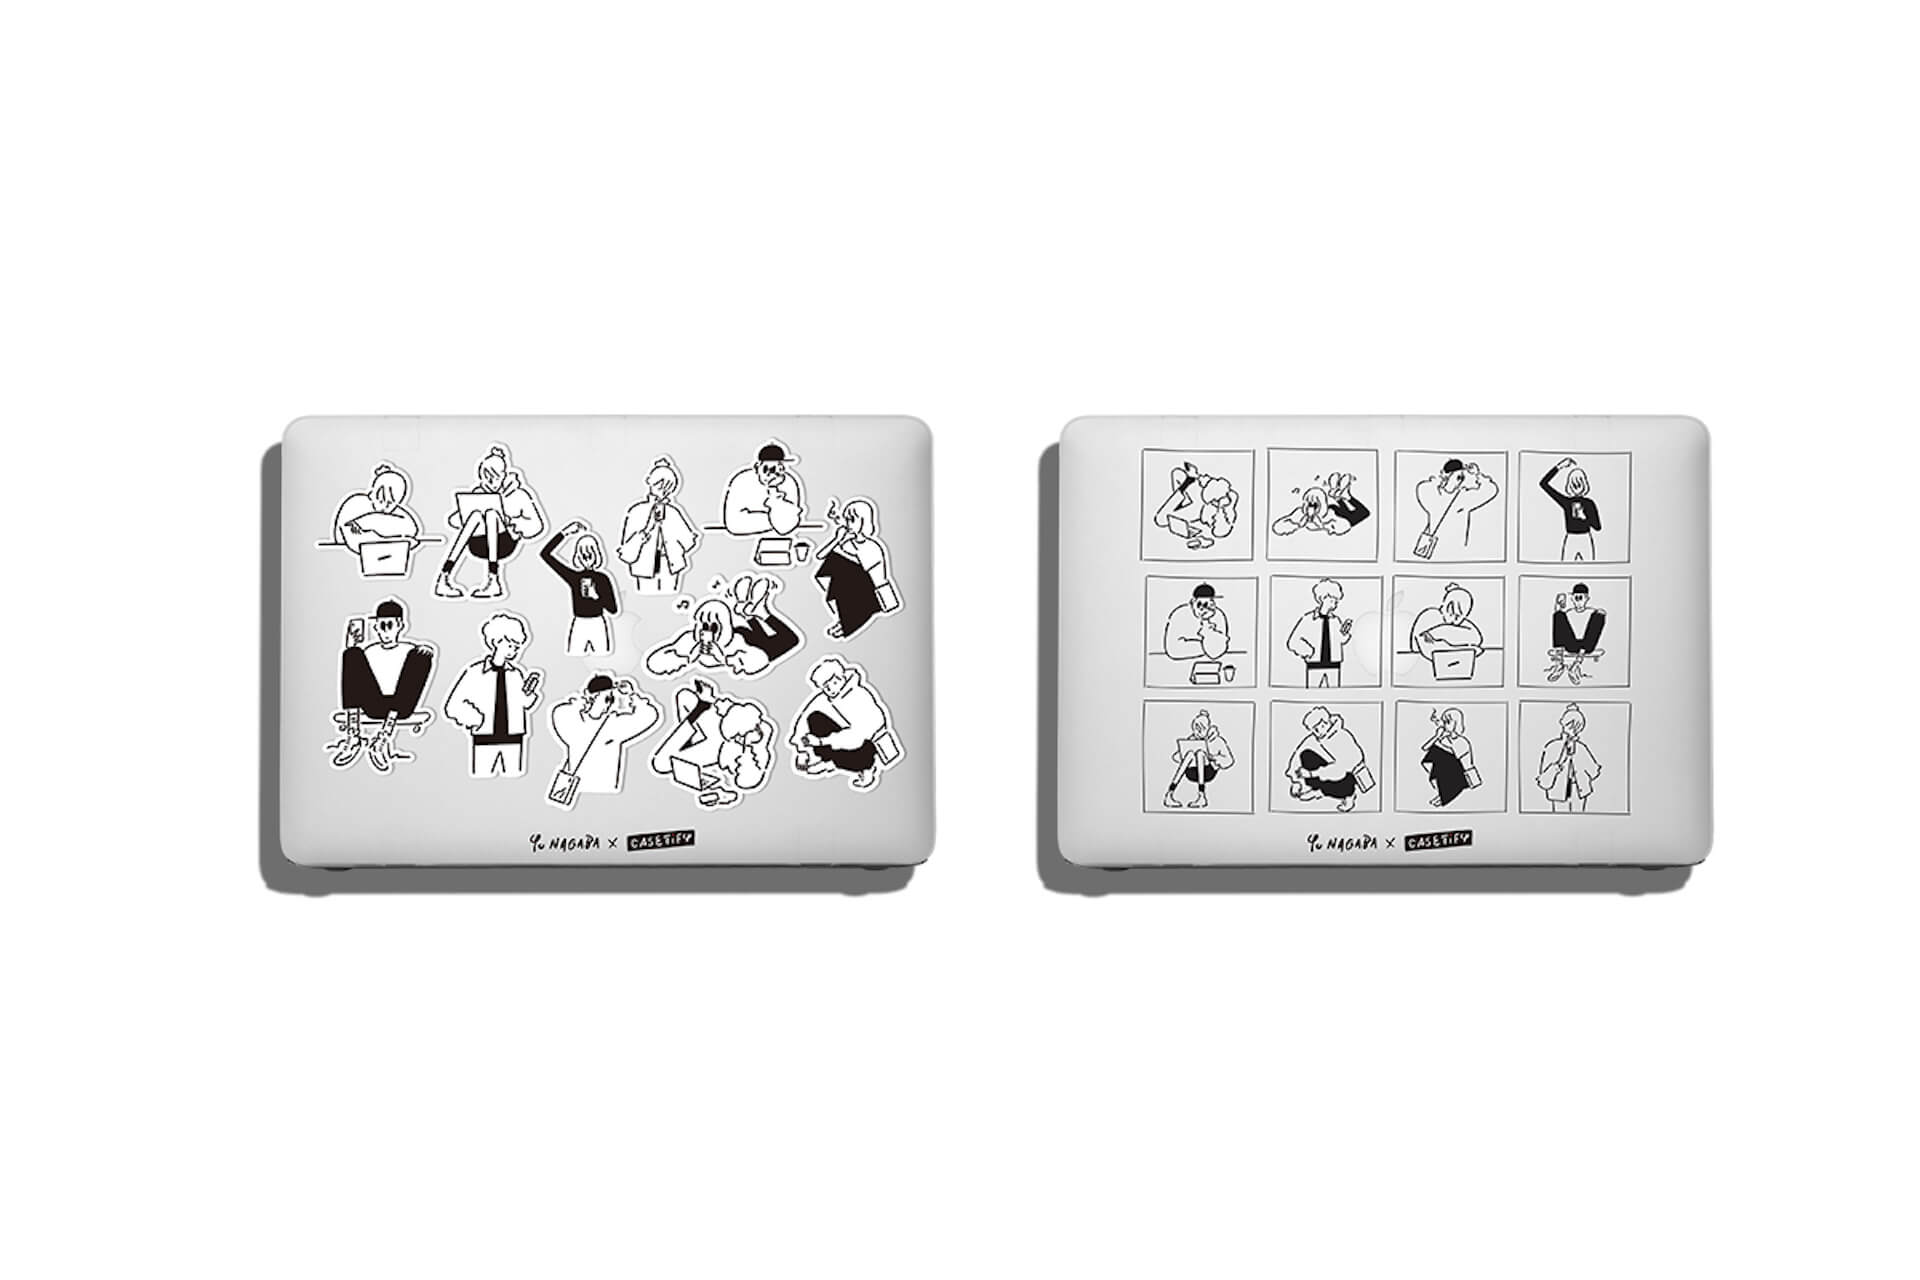 CASETiFYから「Yu Nagaba × CASETiFYコレクション」が登場!描き下ろし手描きフォントのケースや限定アートピース販売も ac200618_castify_yunagaba_08